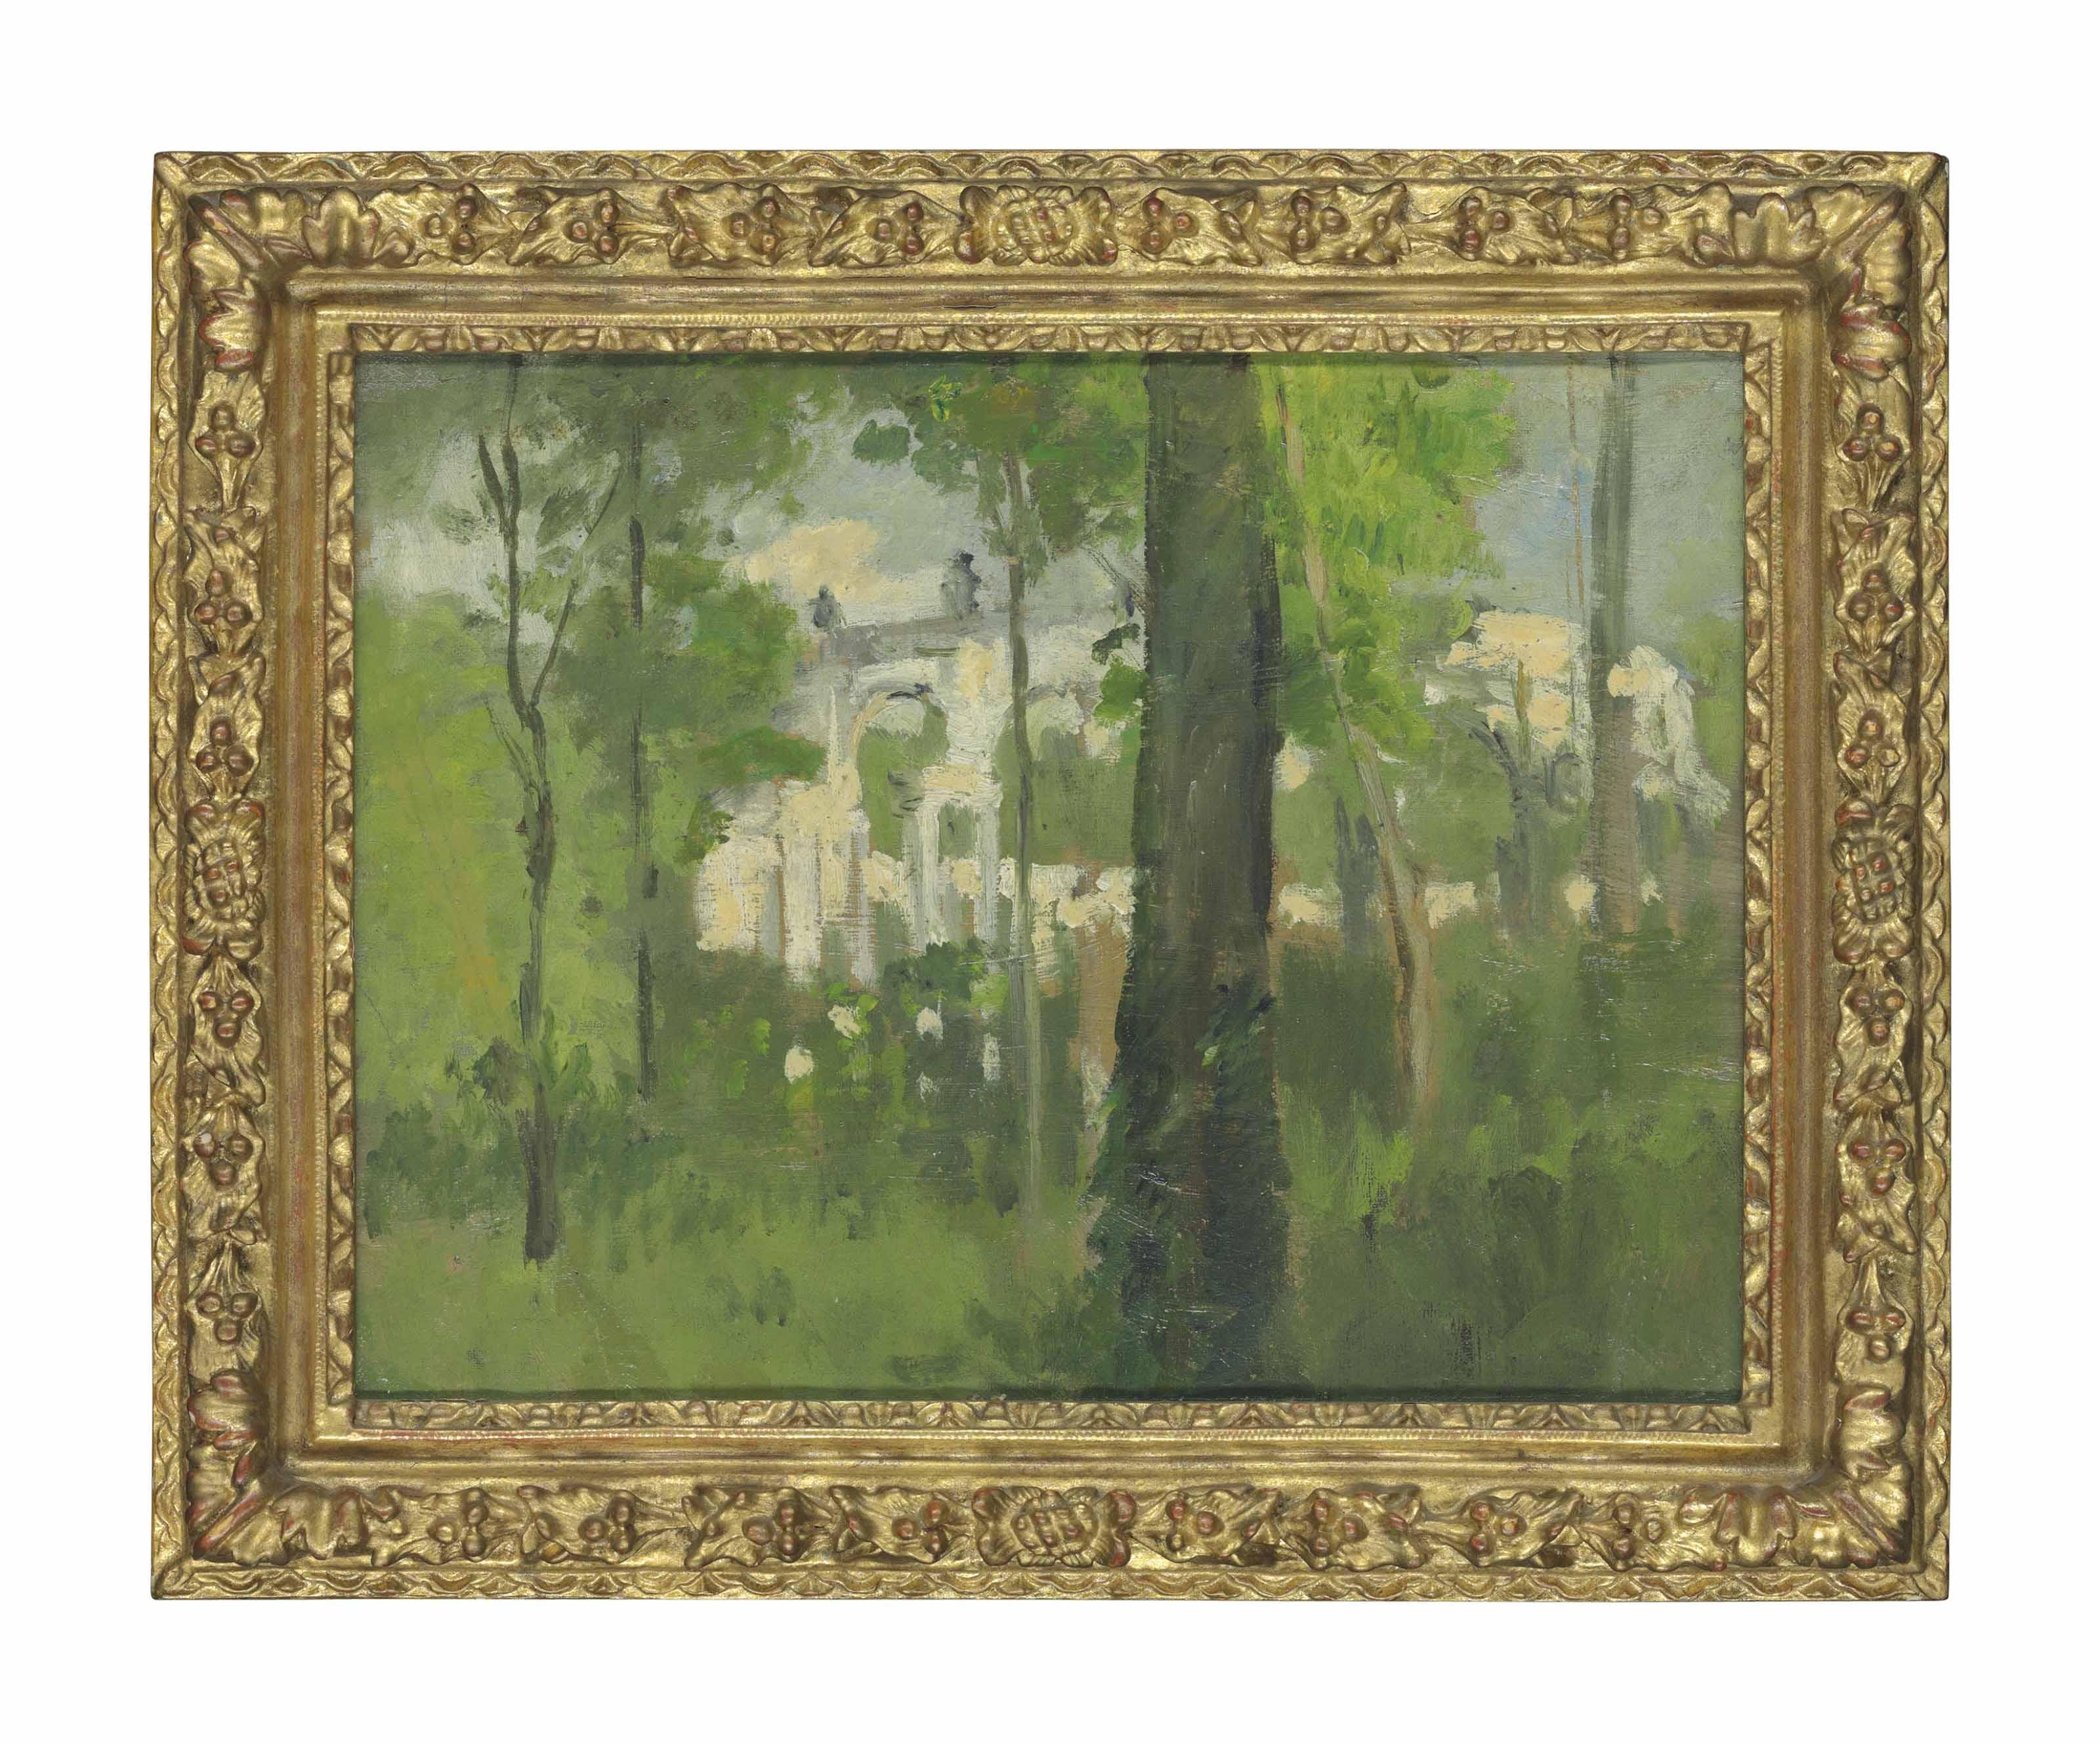 The Petit Trianon, Versailles, seen through trees